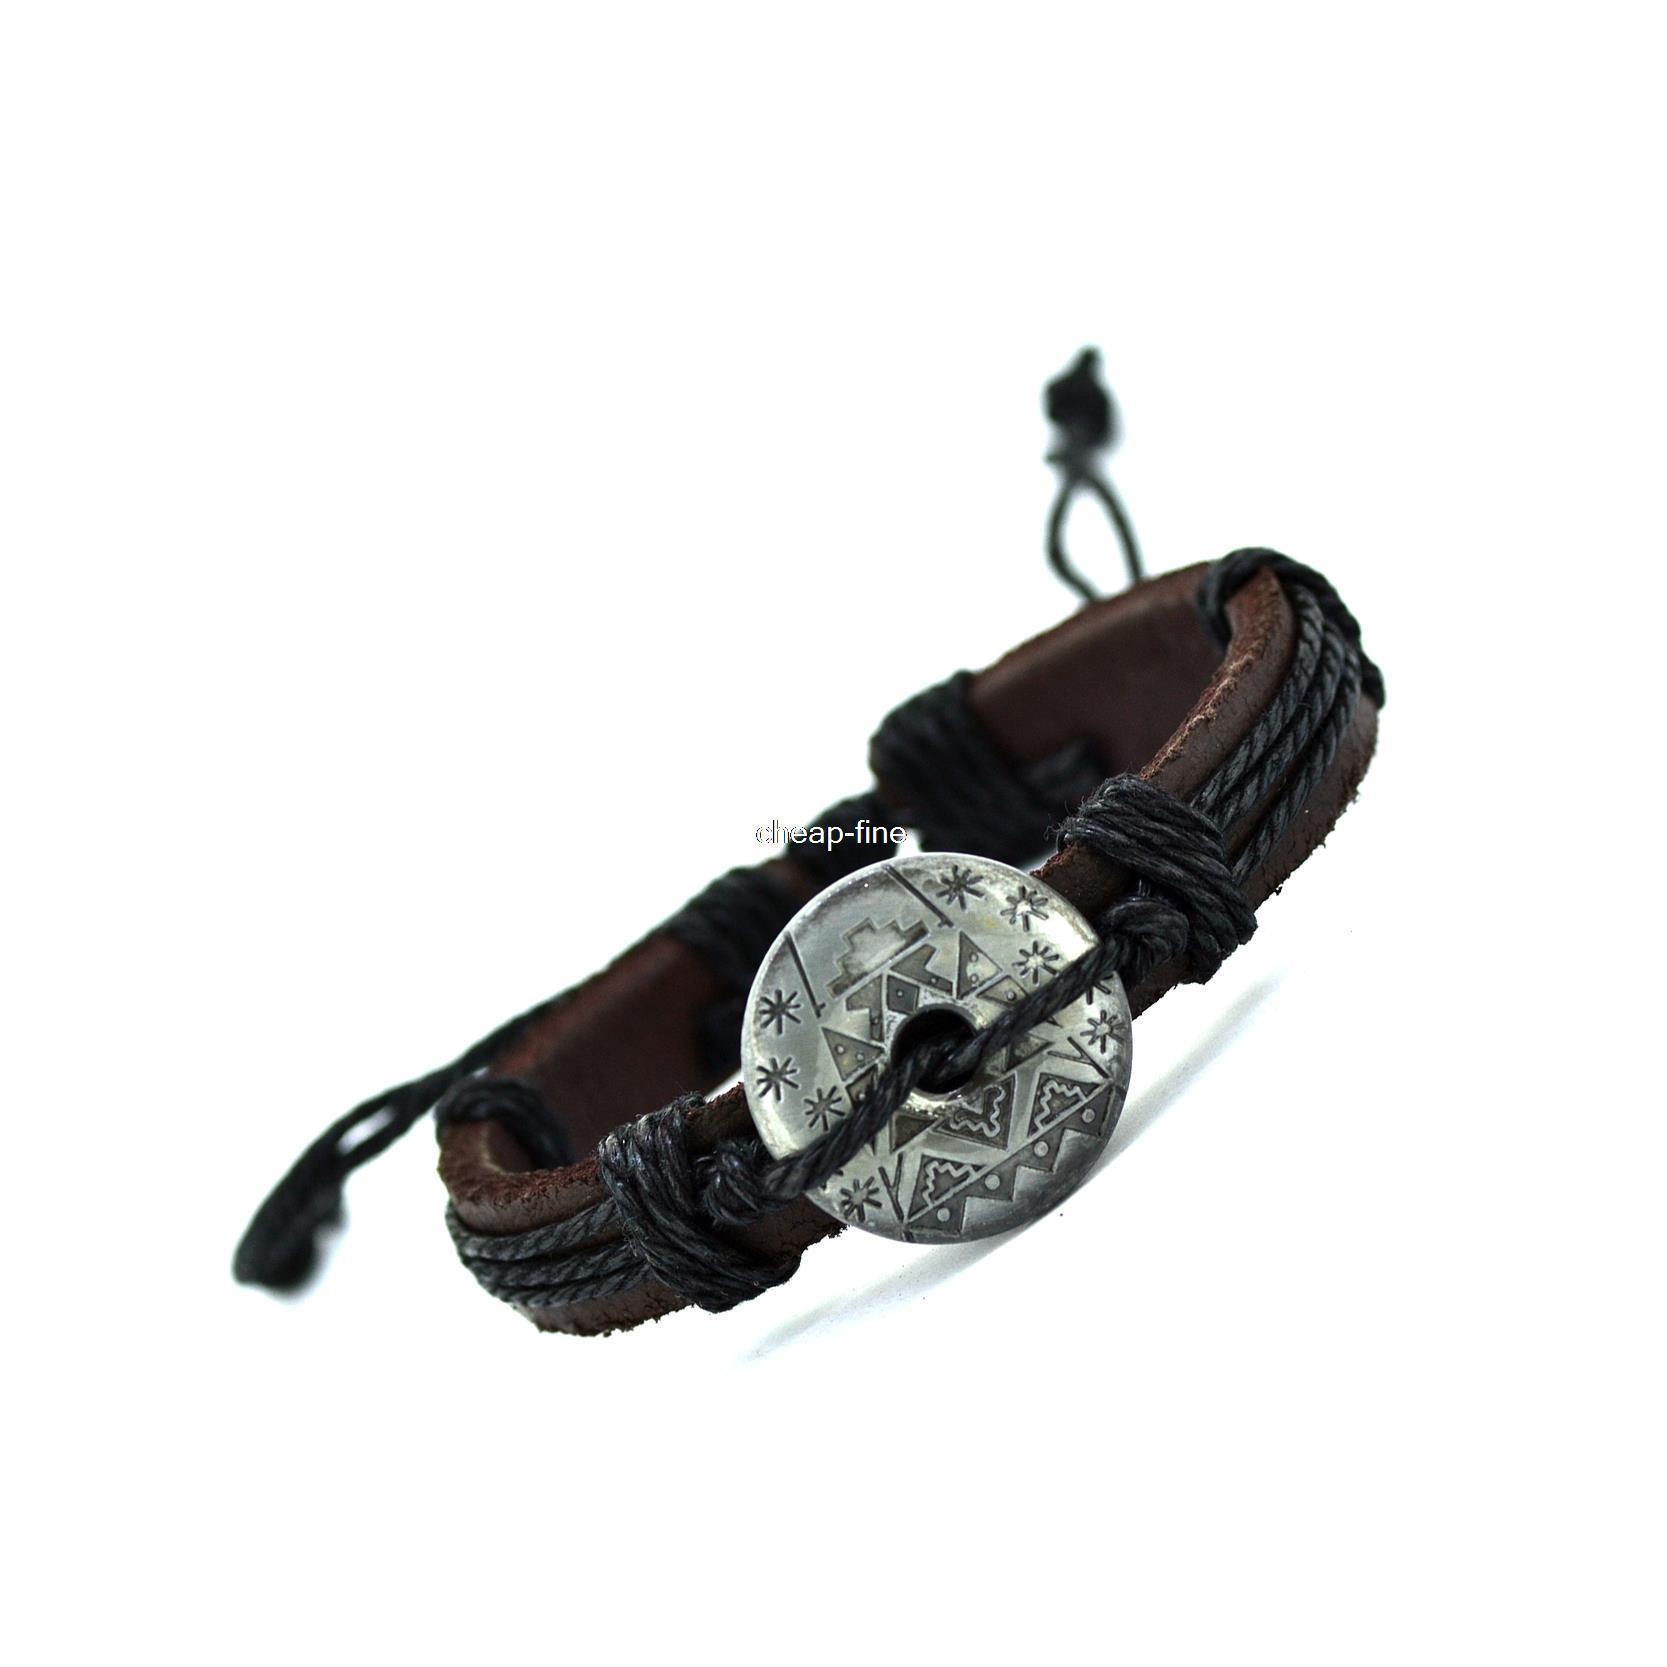 2015 New Genuine Leather Charm Bracelet Cuff Braided Wrap Bracelet & Bangles Fashion For Women Men Gifts(China (Mainland))